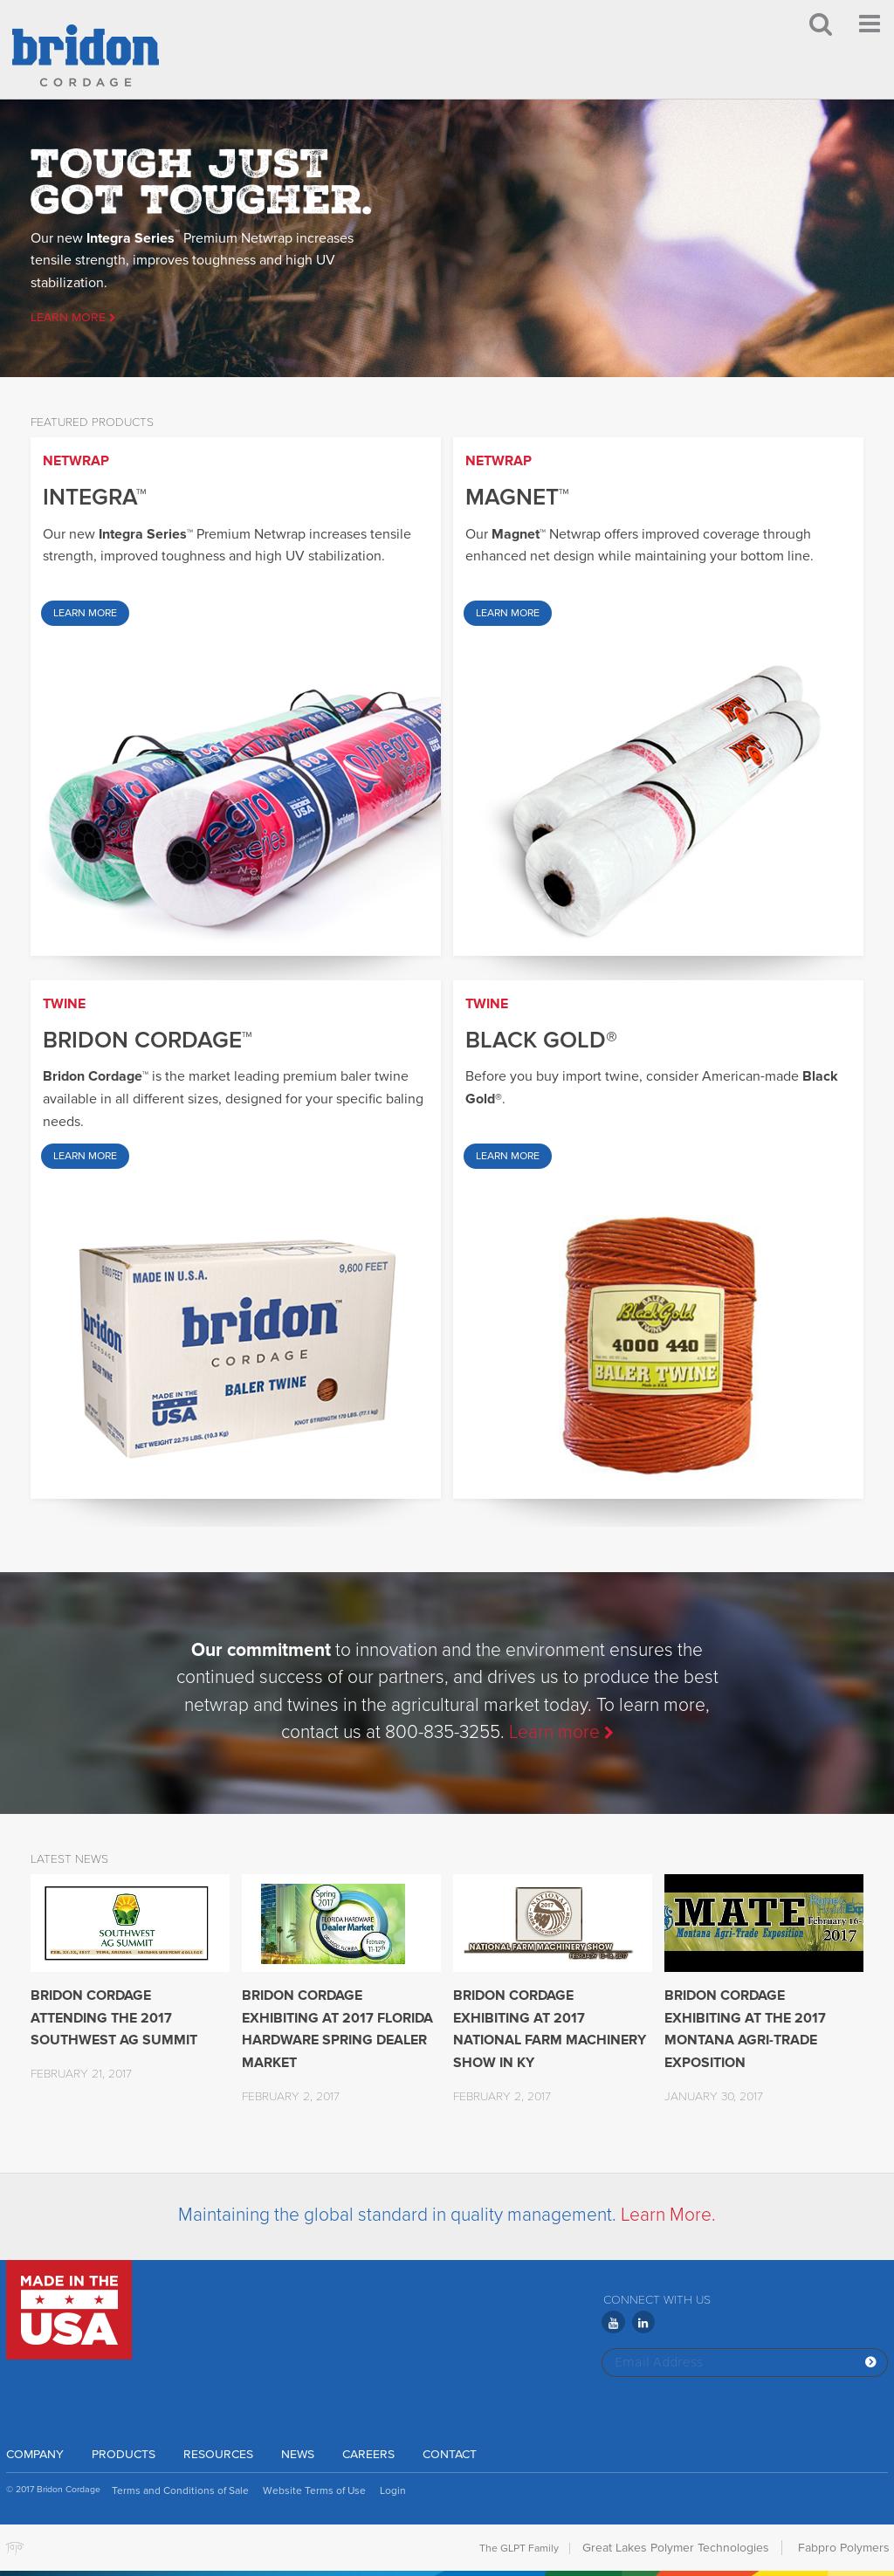 Bridon Cordage Competitors, Revenue and Employees - Owler Company